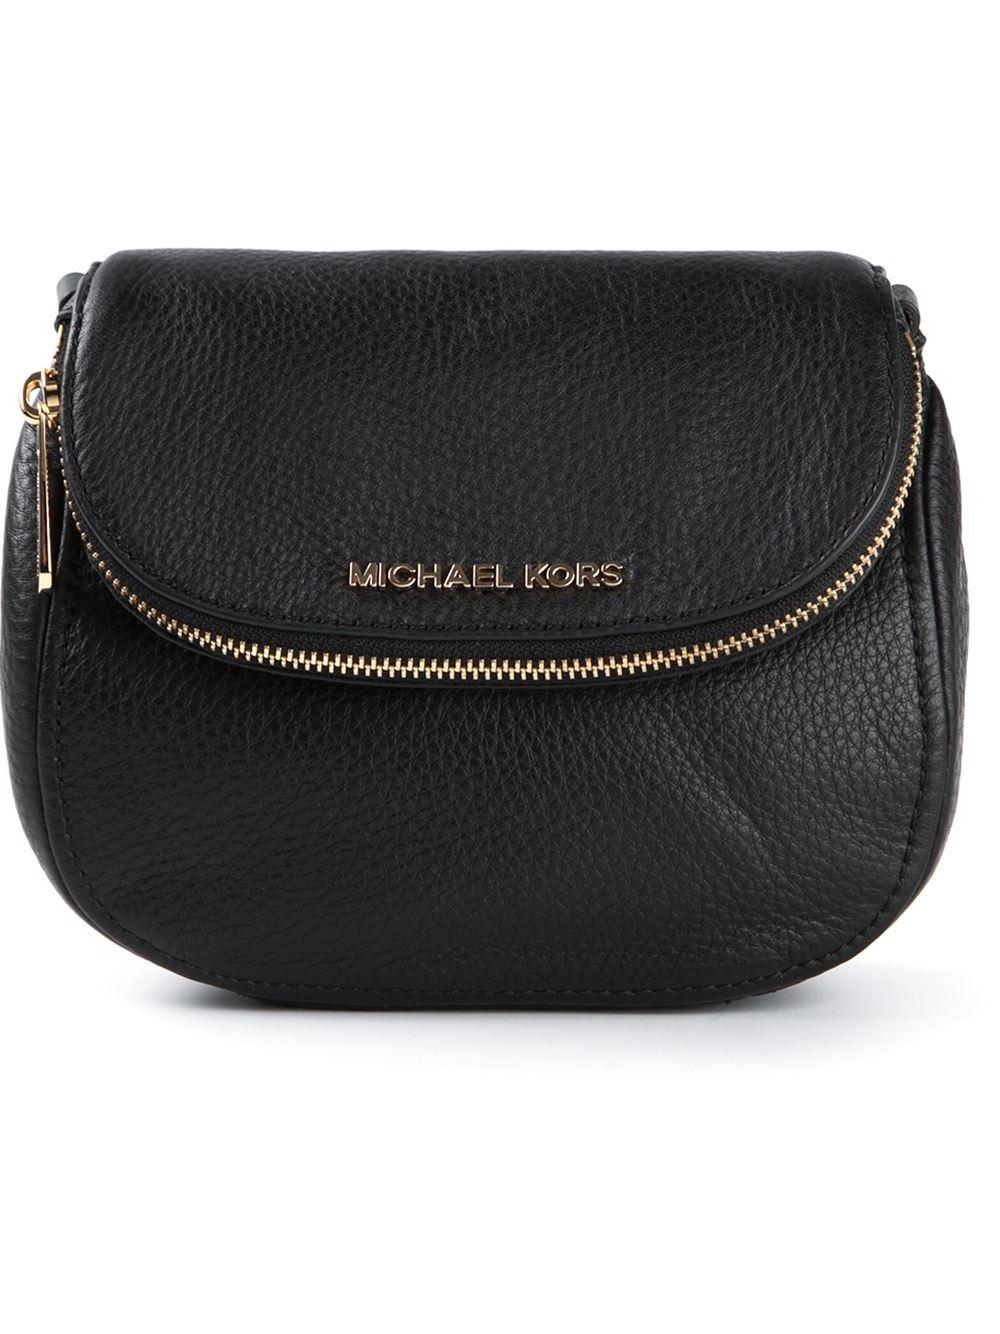 michael michael kors bedford flap crossbody bag in black